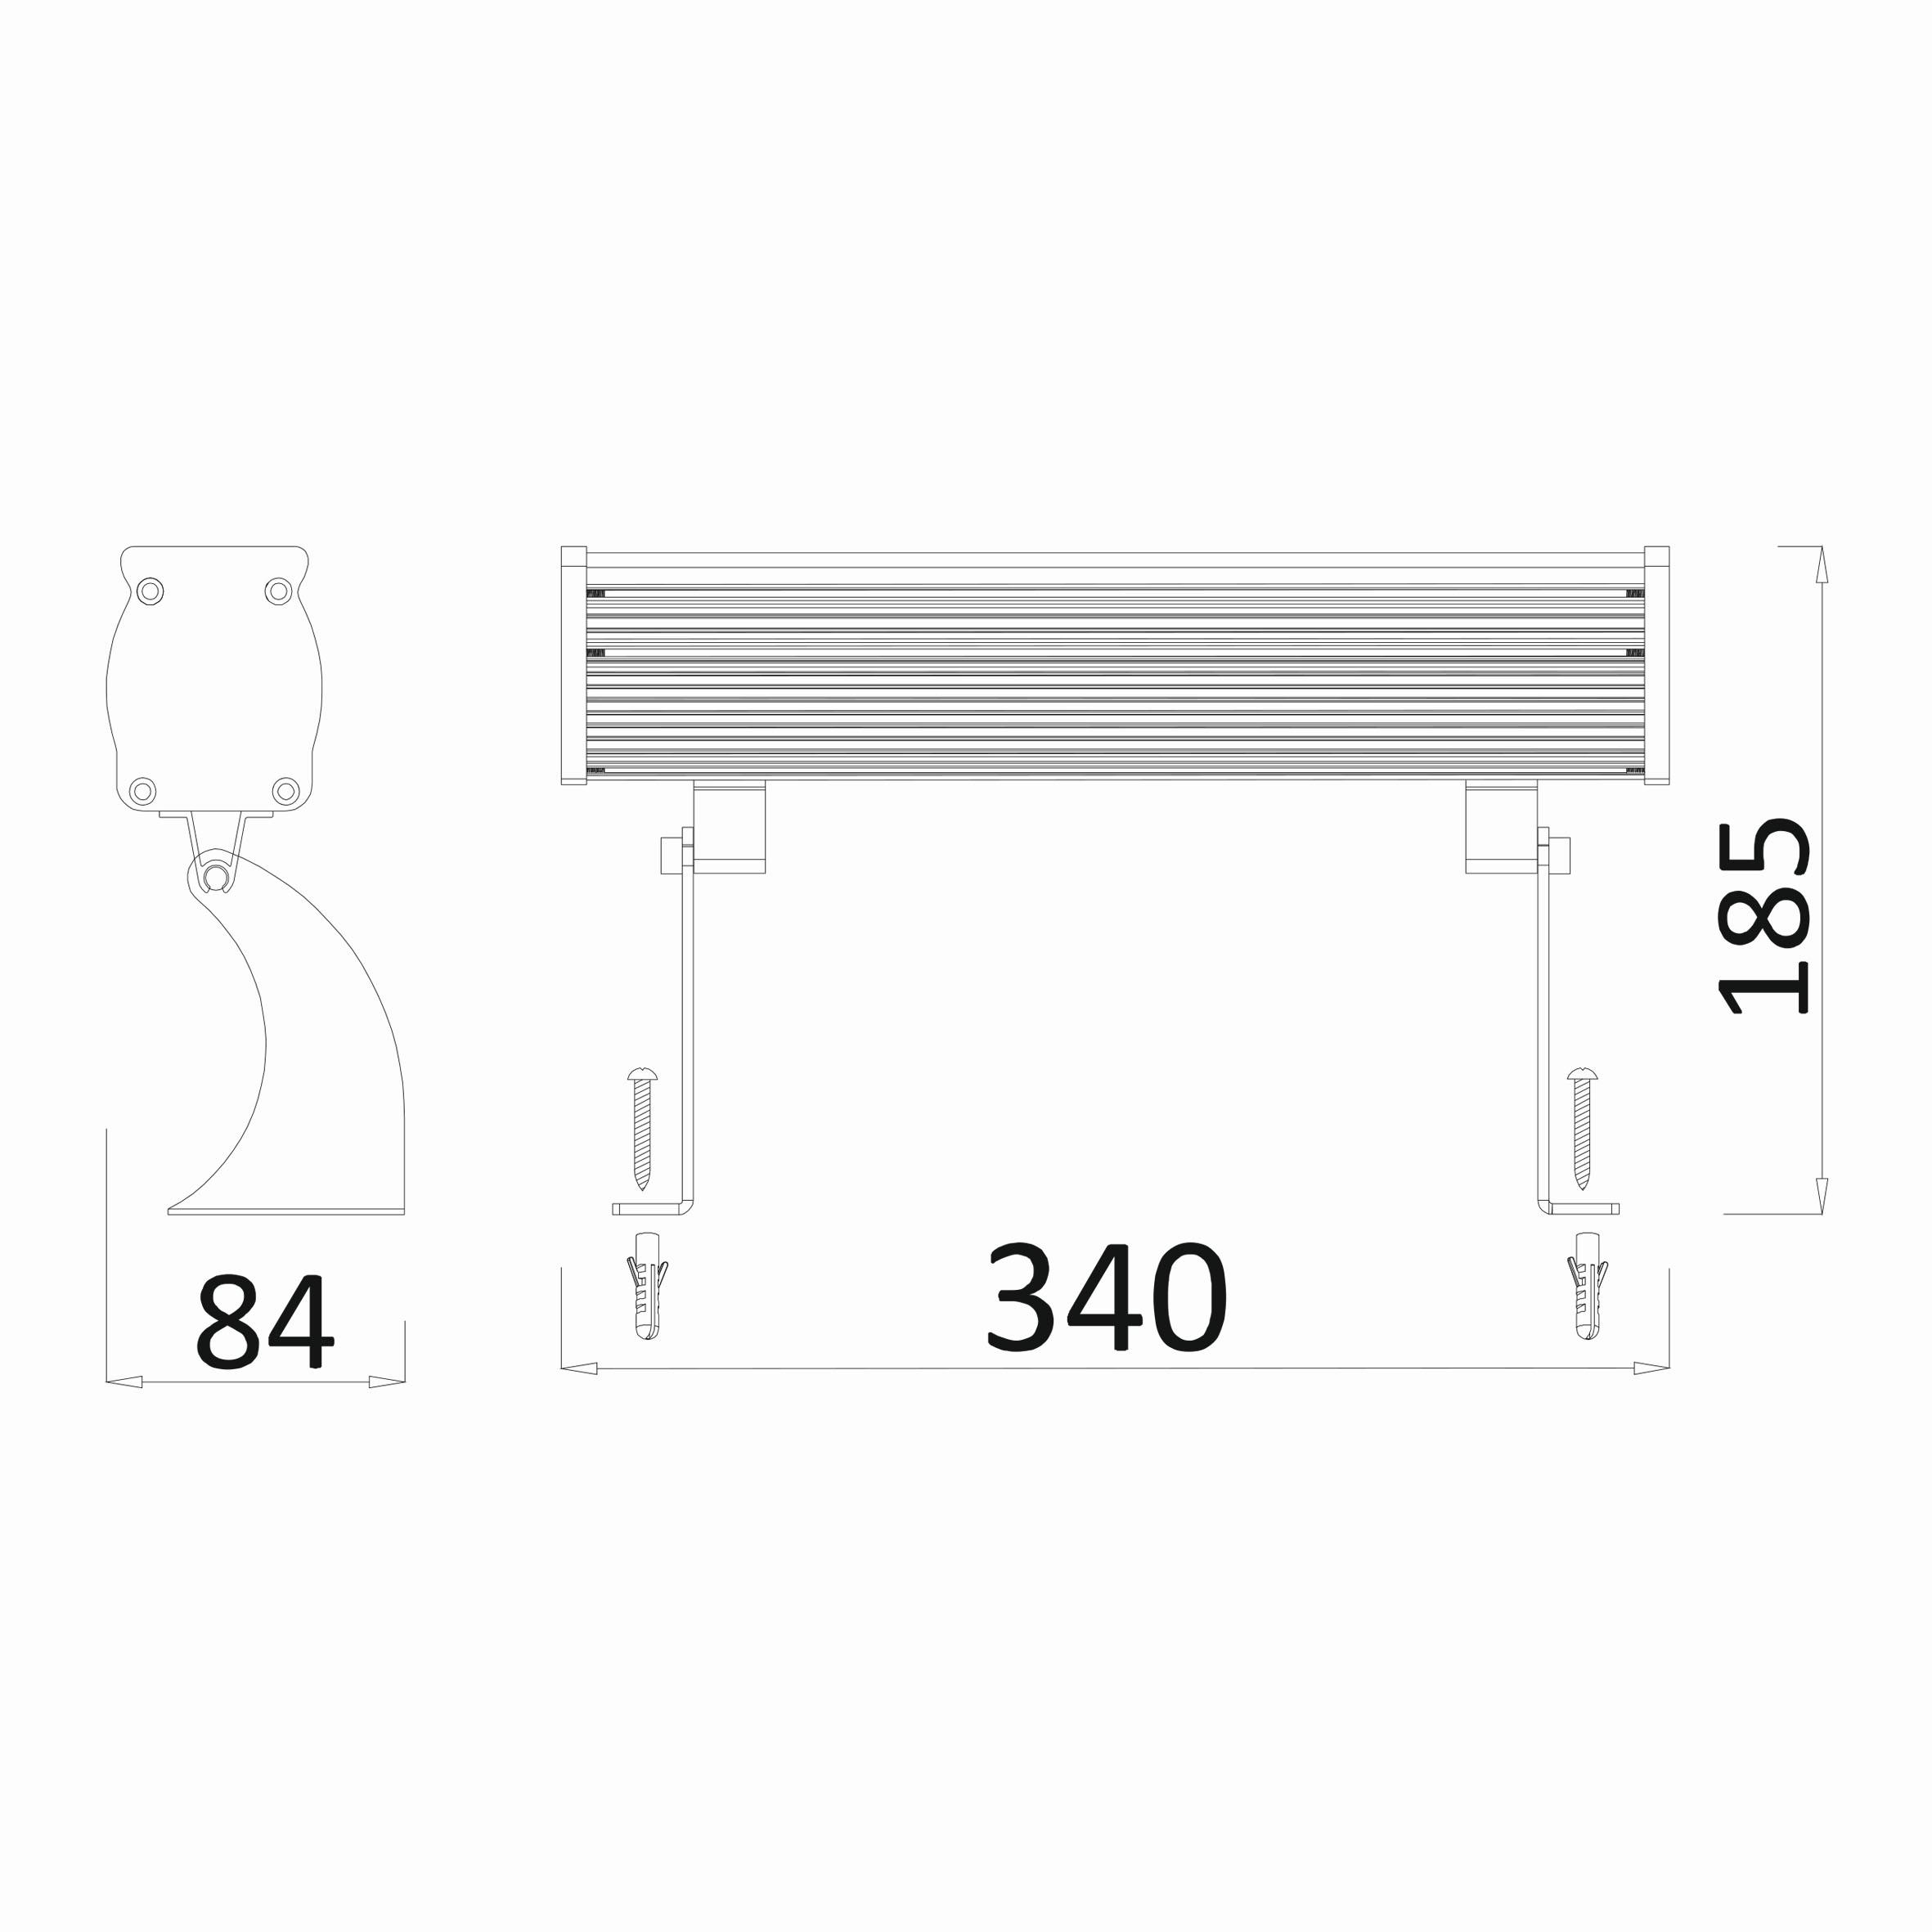 12w 0.34mt 12 Ledli RGB Wall Washer